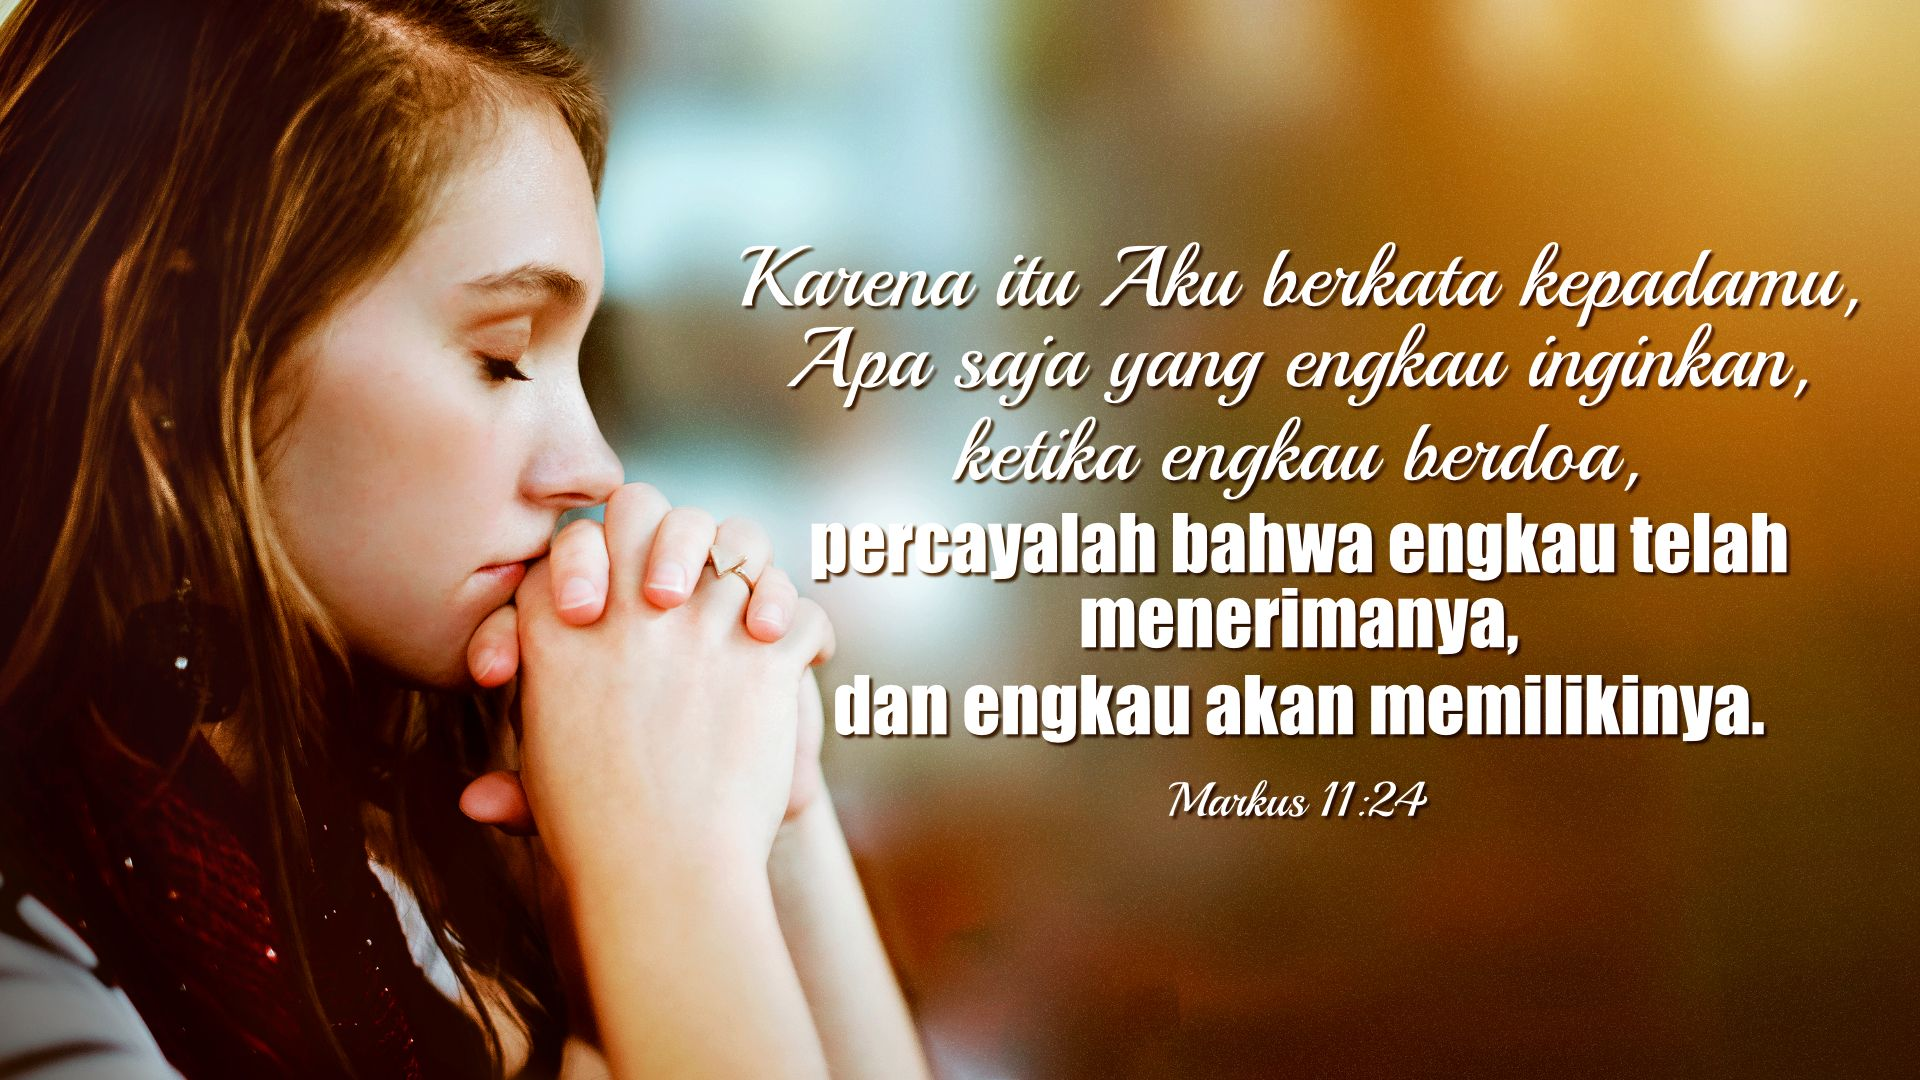 Markus 11 24 Ayat Alkitab Alkitab Mazmur 46